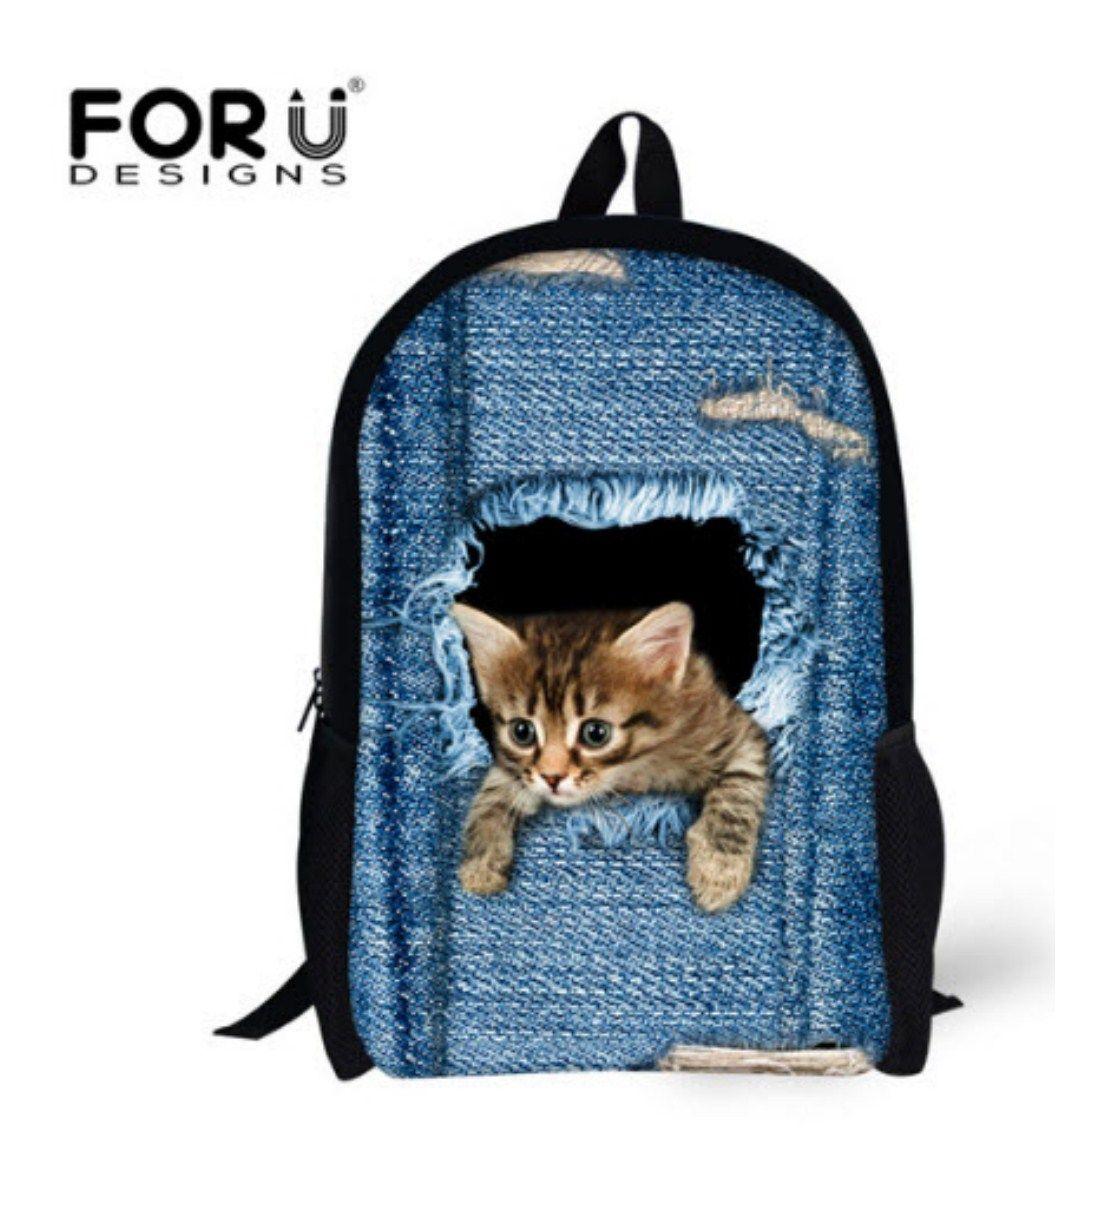 C3301C Denim Children School Bag For Girls Cute Cat Dog Head Kids Schoolbags  3D Cartoon Animal School Backpack Outdoor Sport Mochila 41524d2a9dbc0